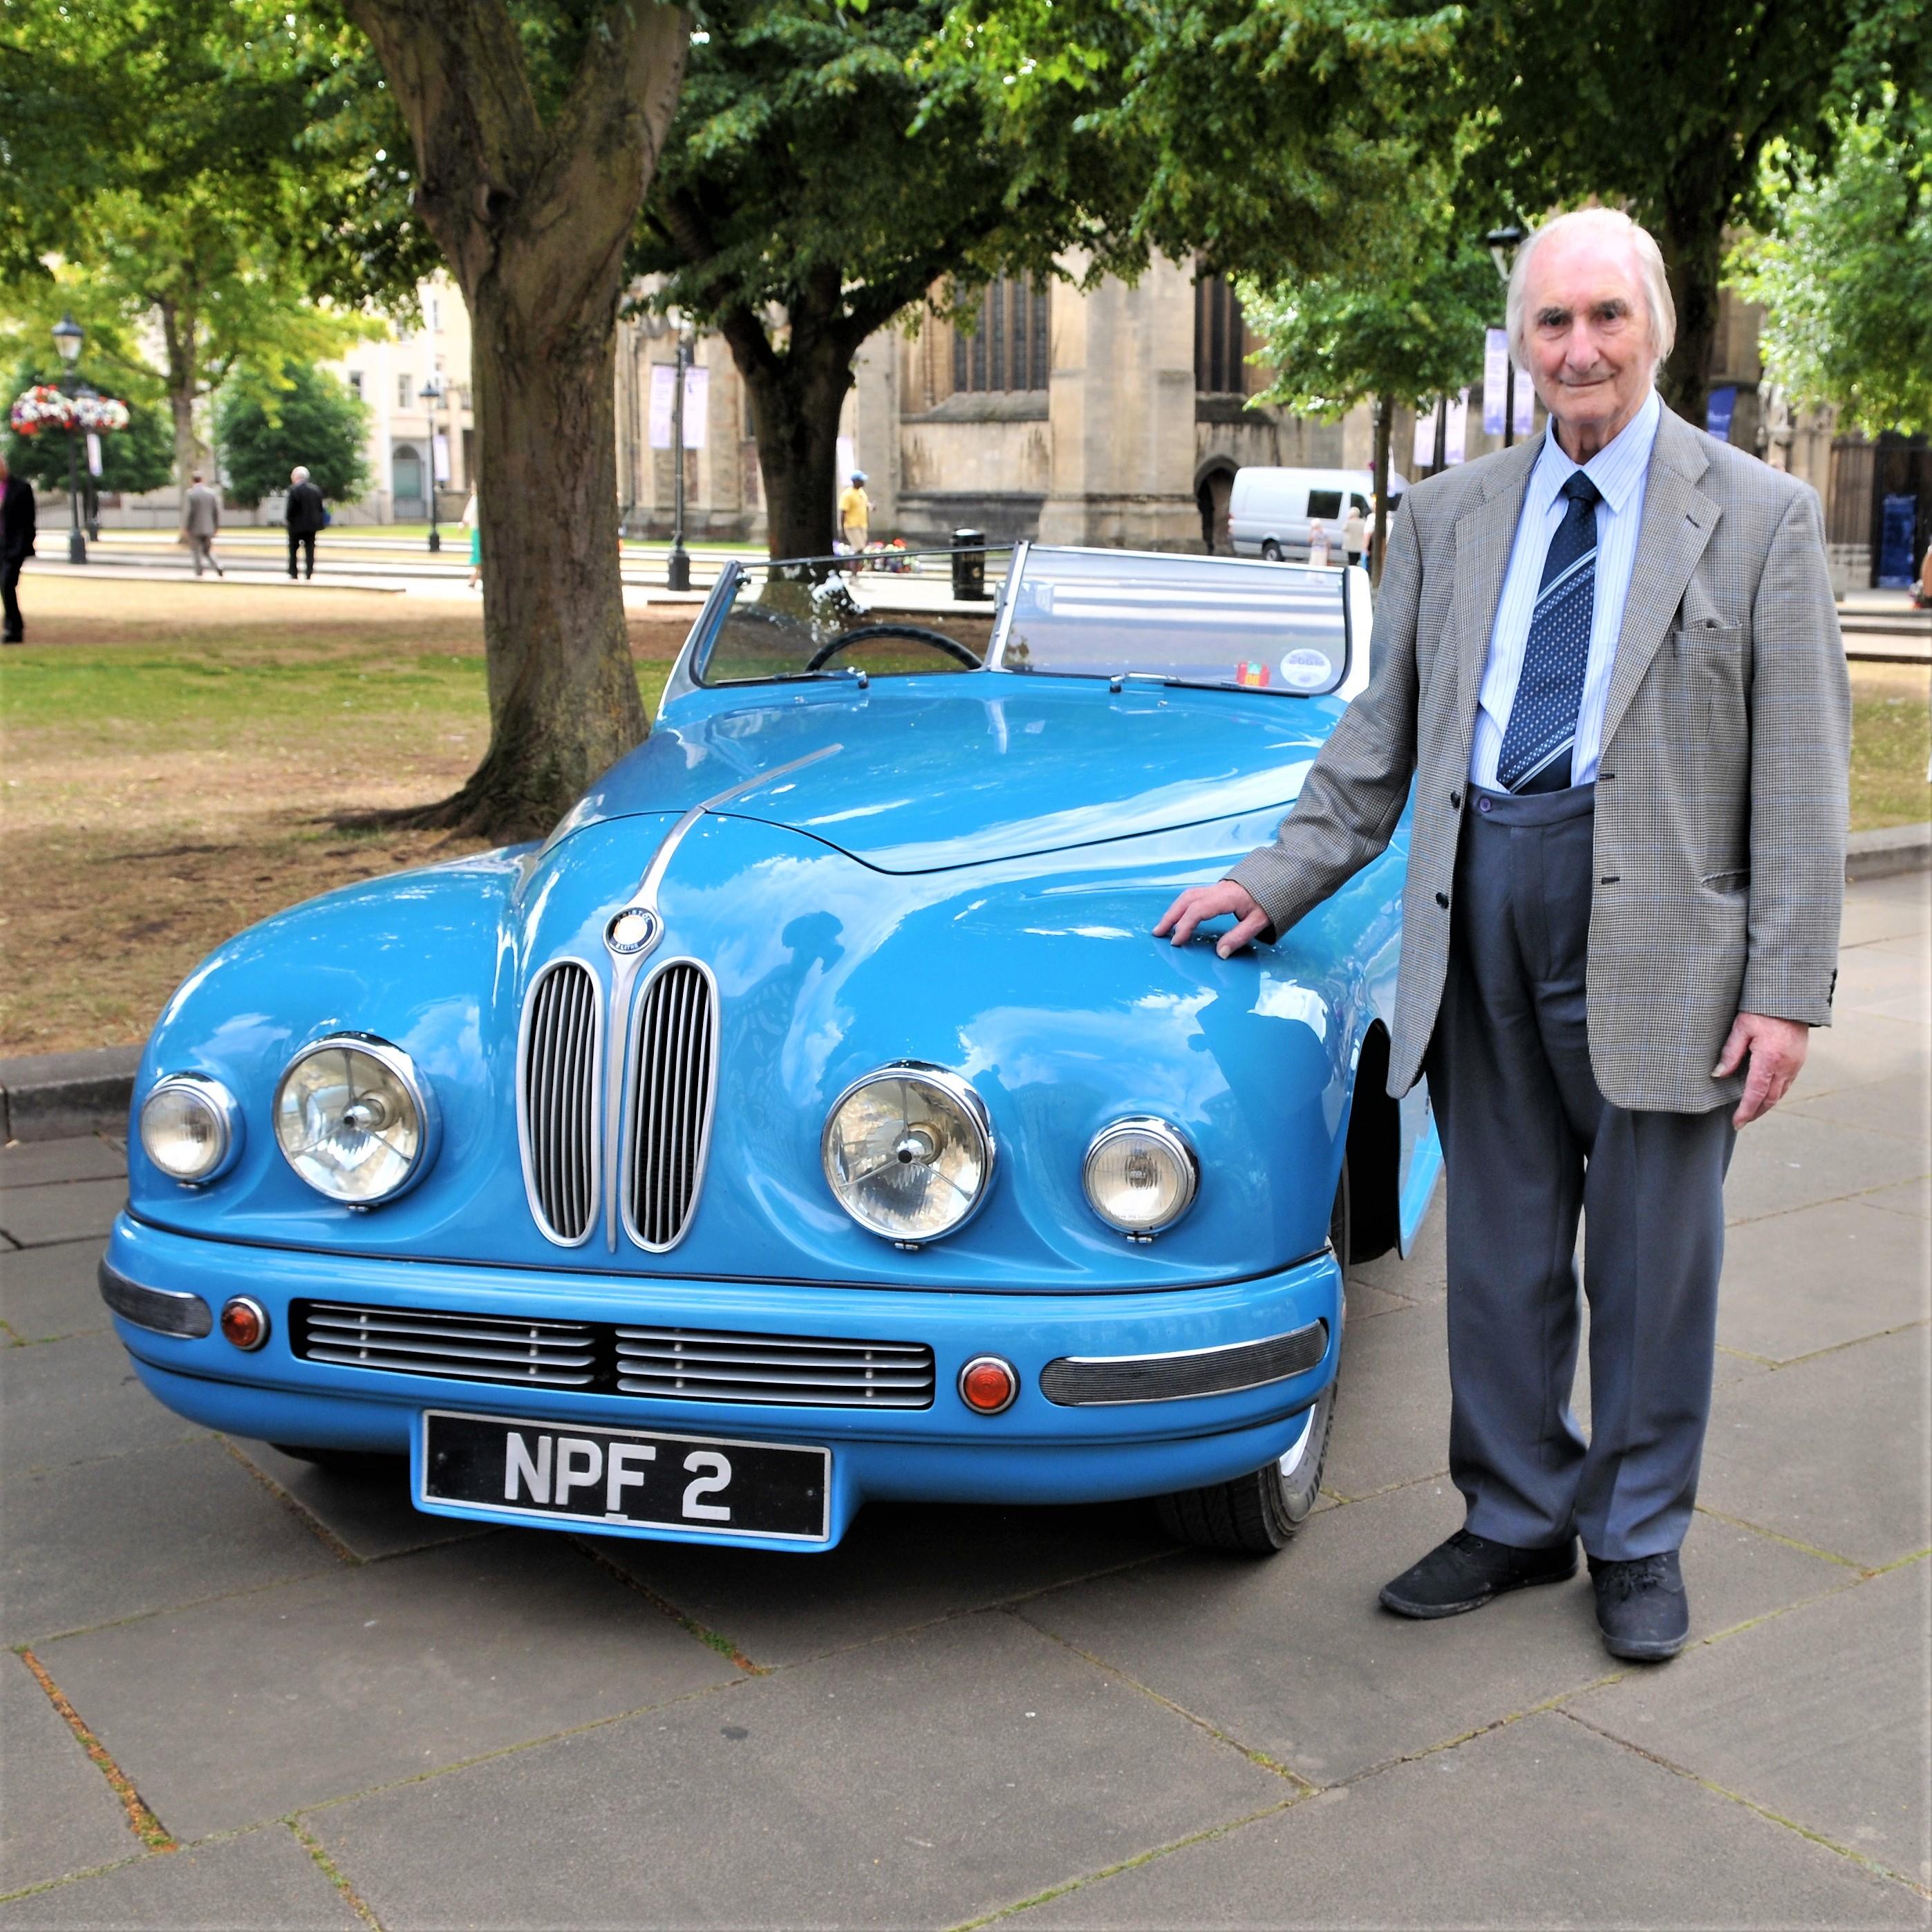 Syd Lovesy with Bristol Car in London